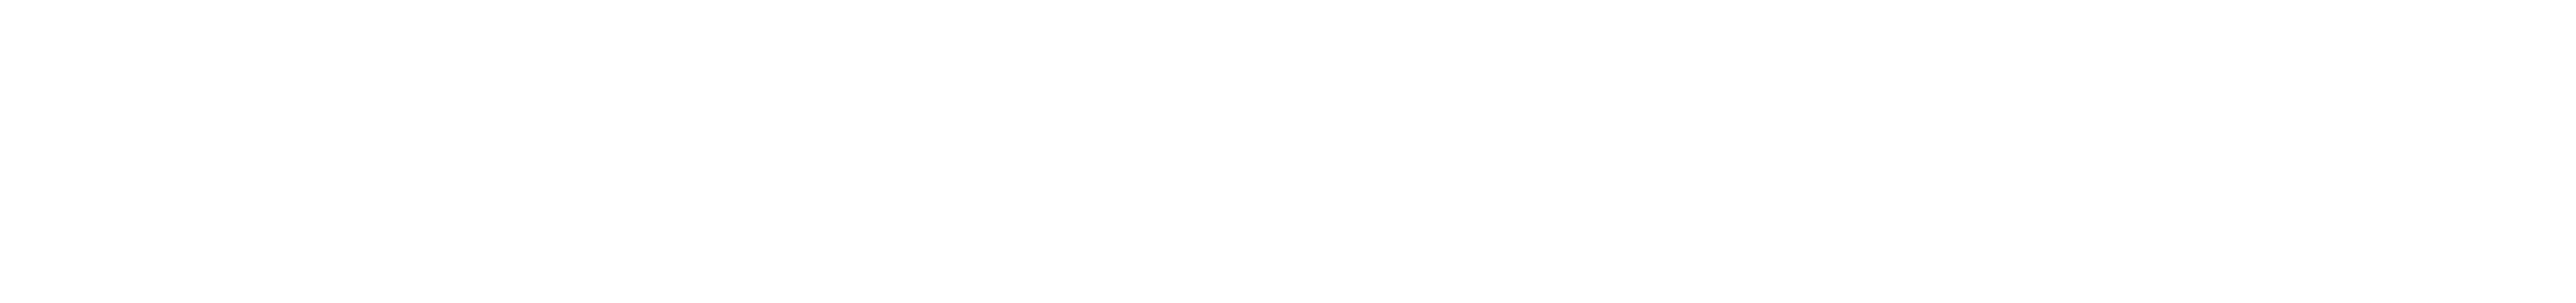 DMI Intertech